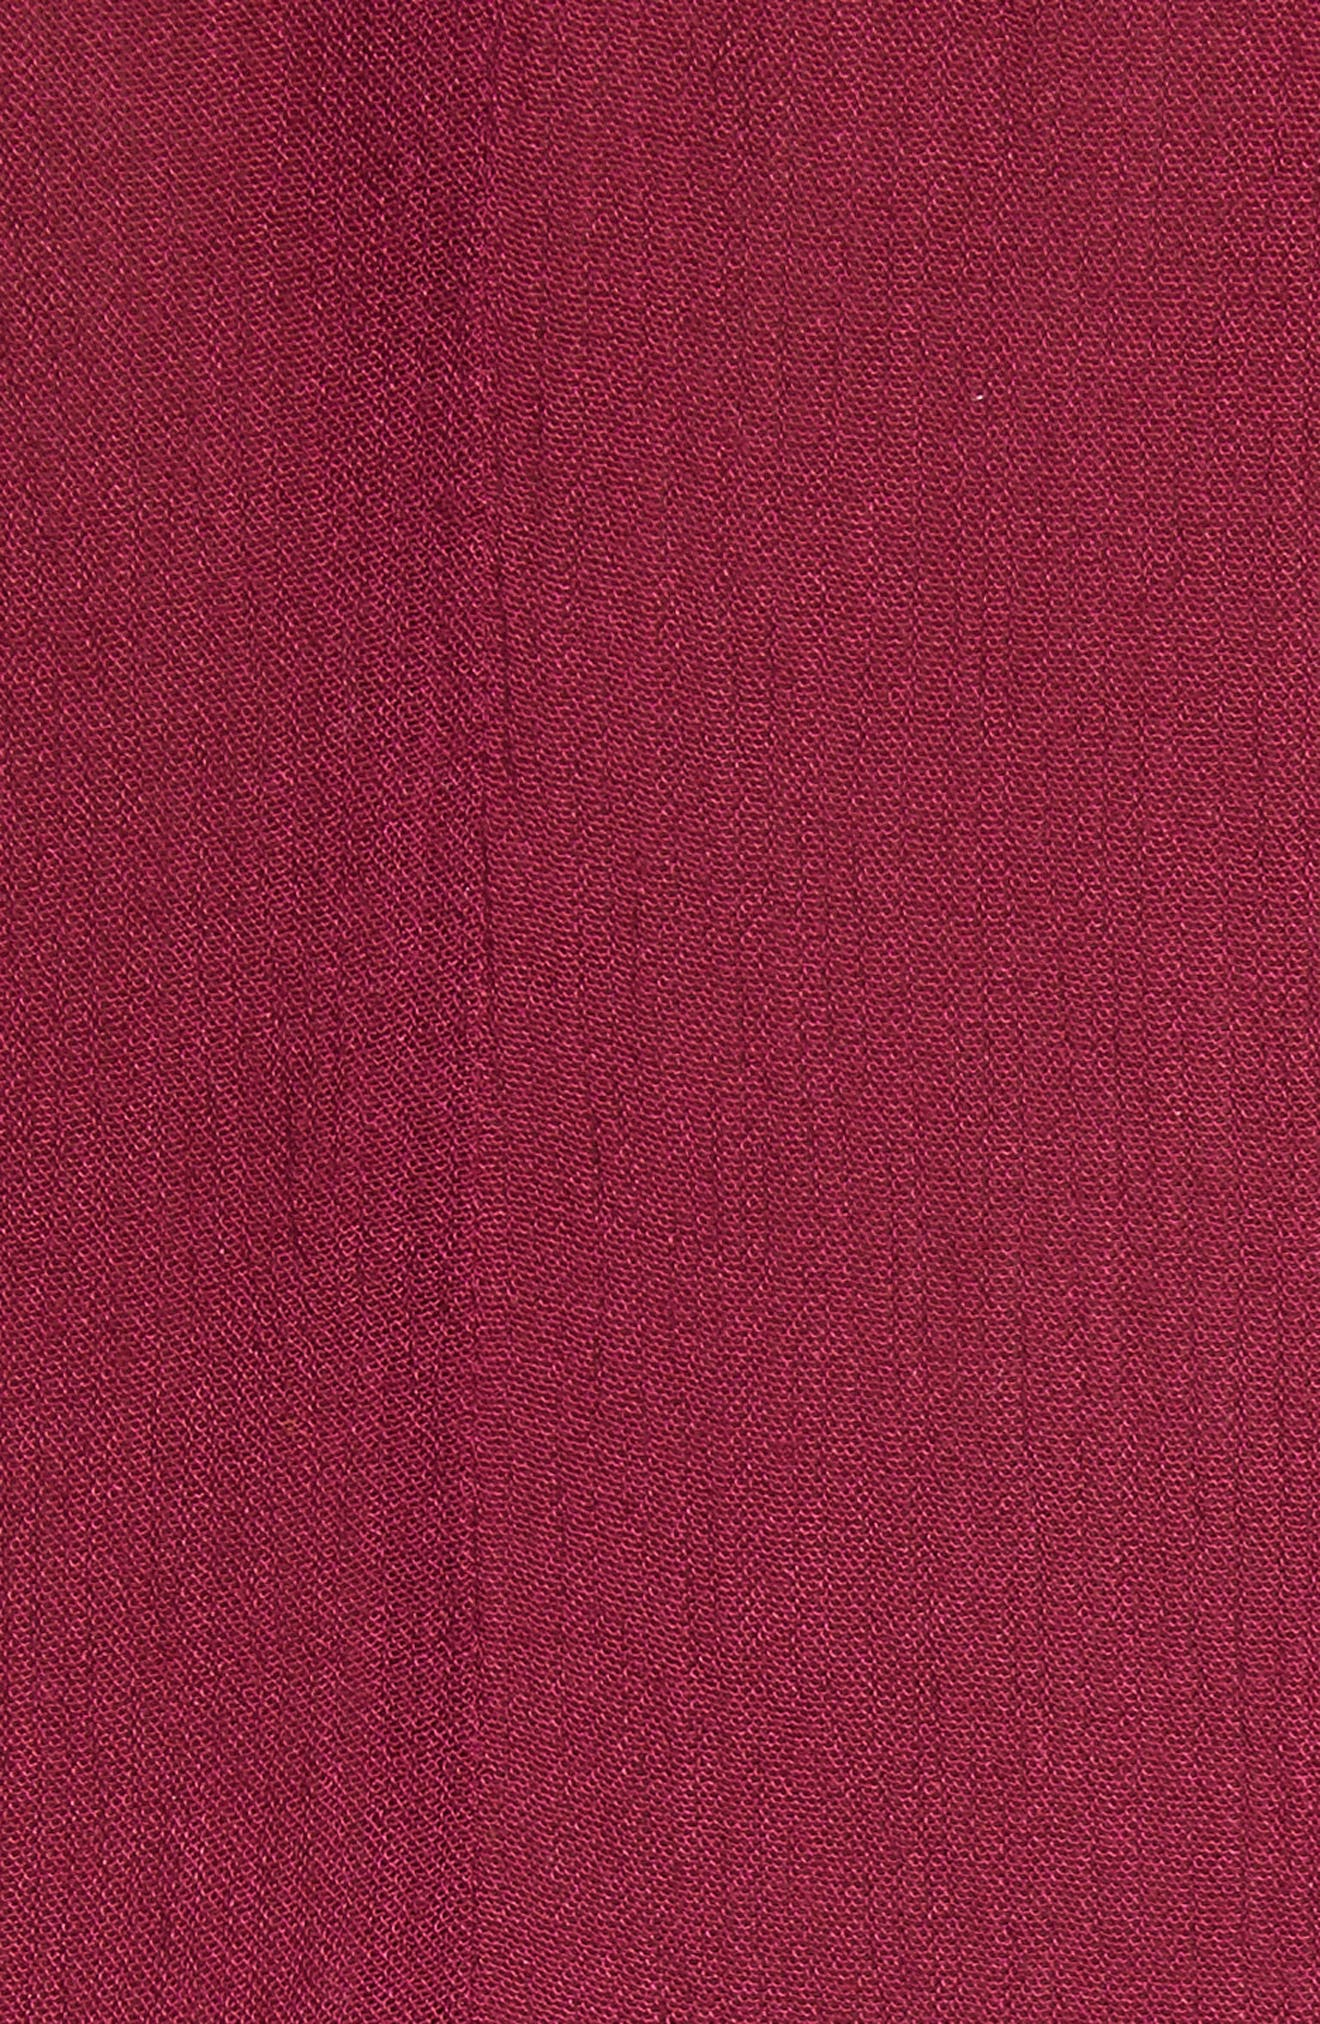 Delphine Embellished Slipdress,                             Alternate thumbnail 5, color,                             Plum